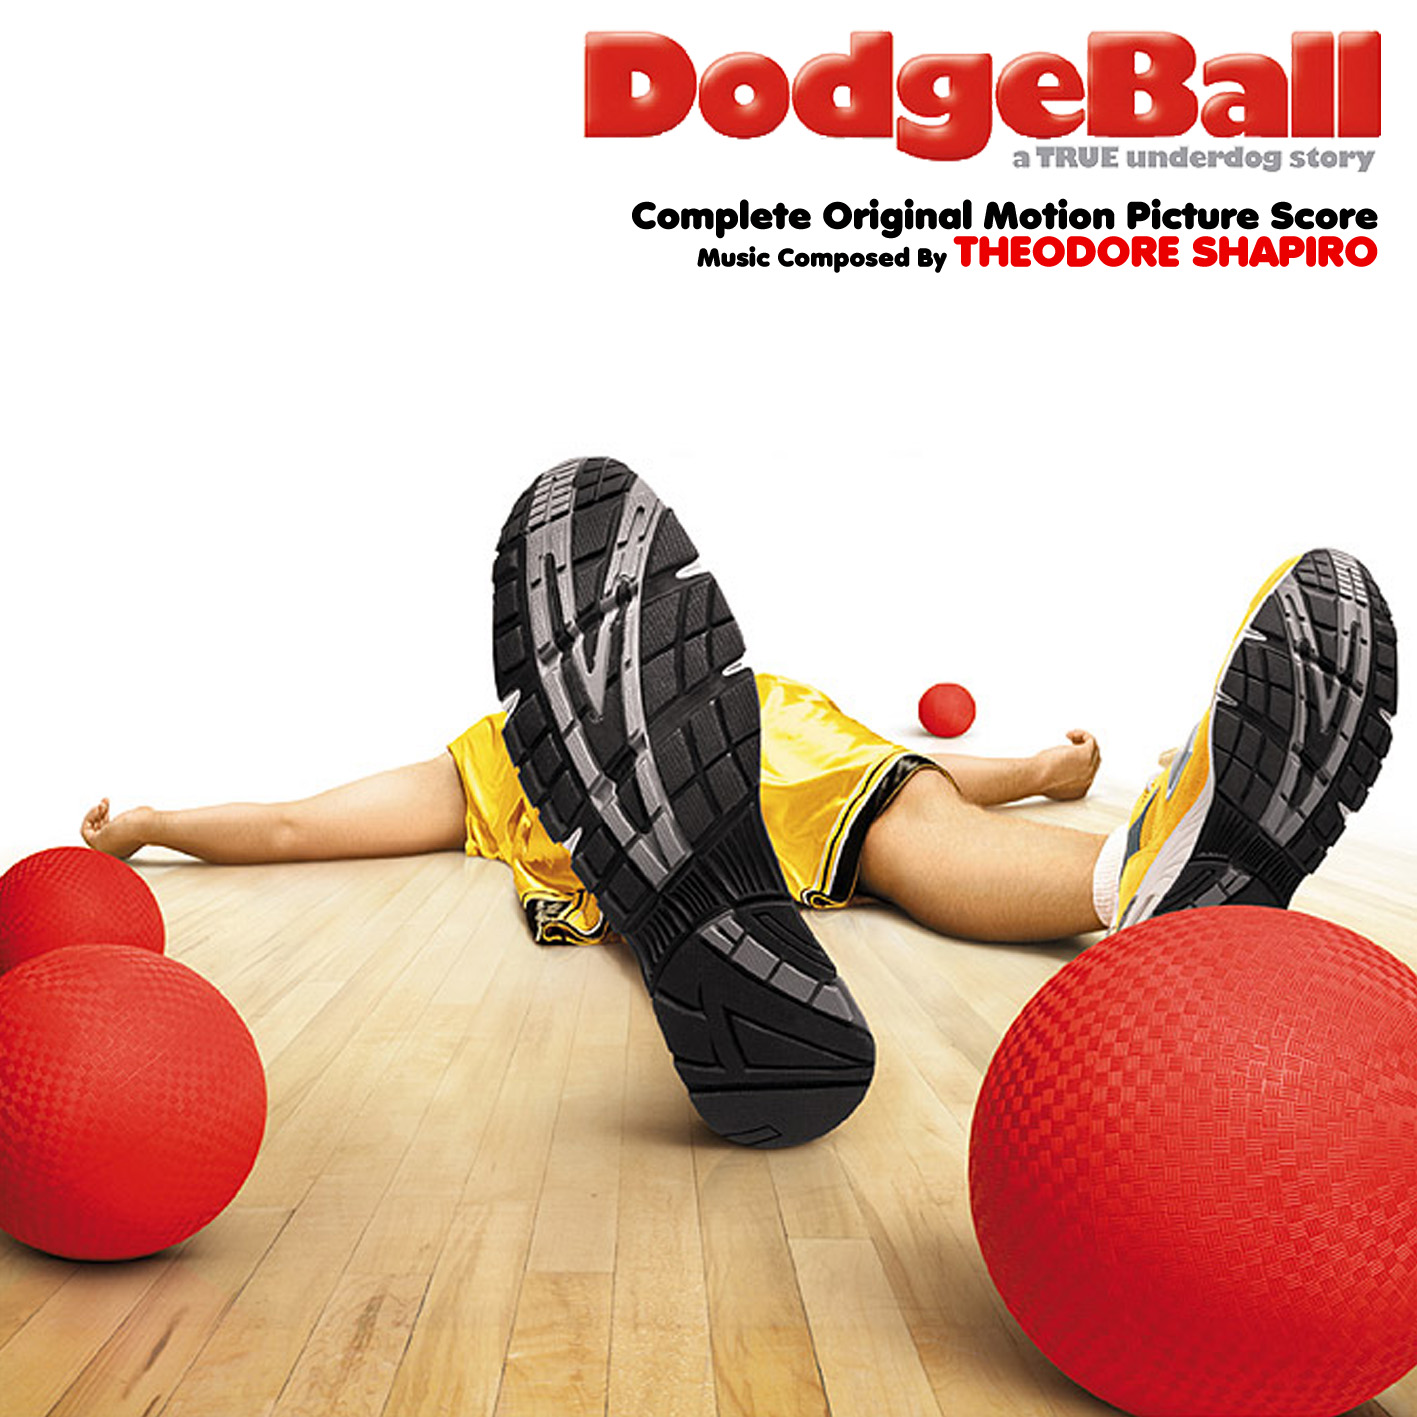 dodgeball a true underdog story 2004